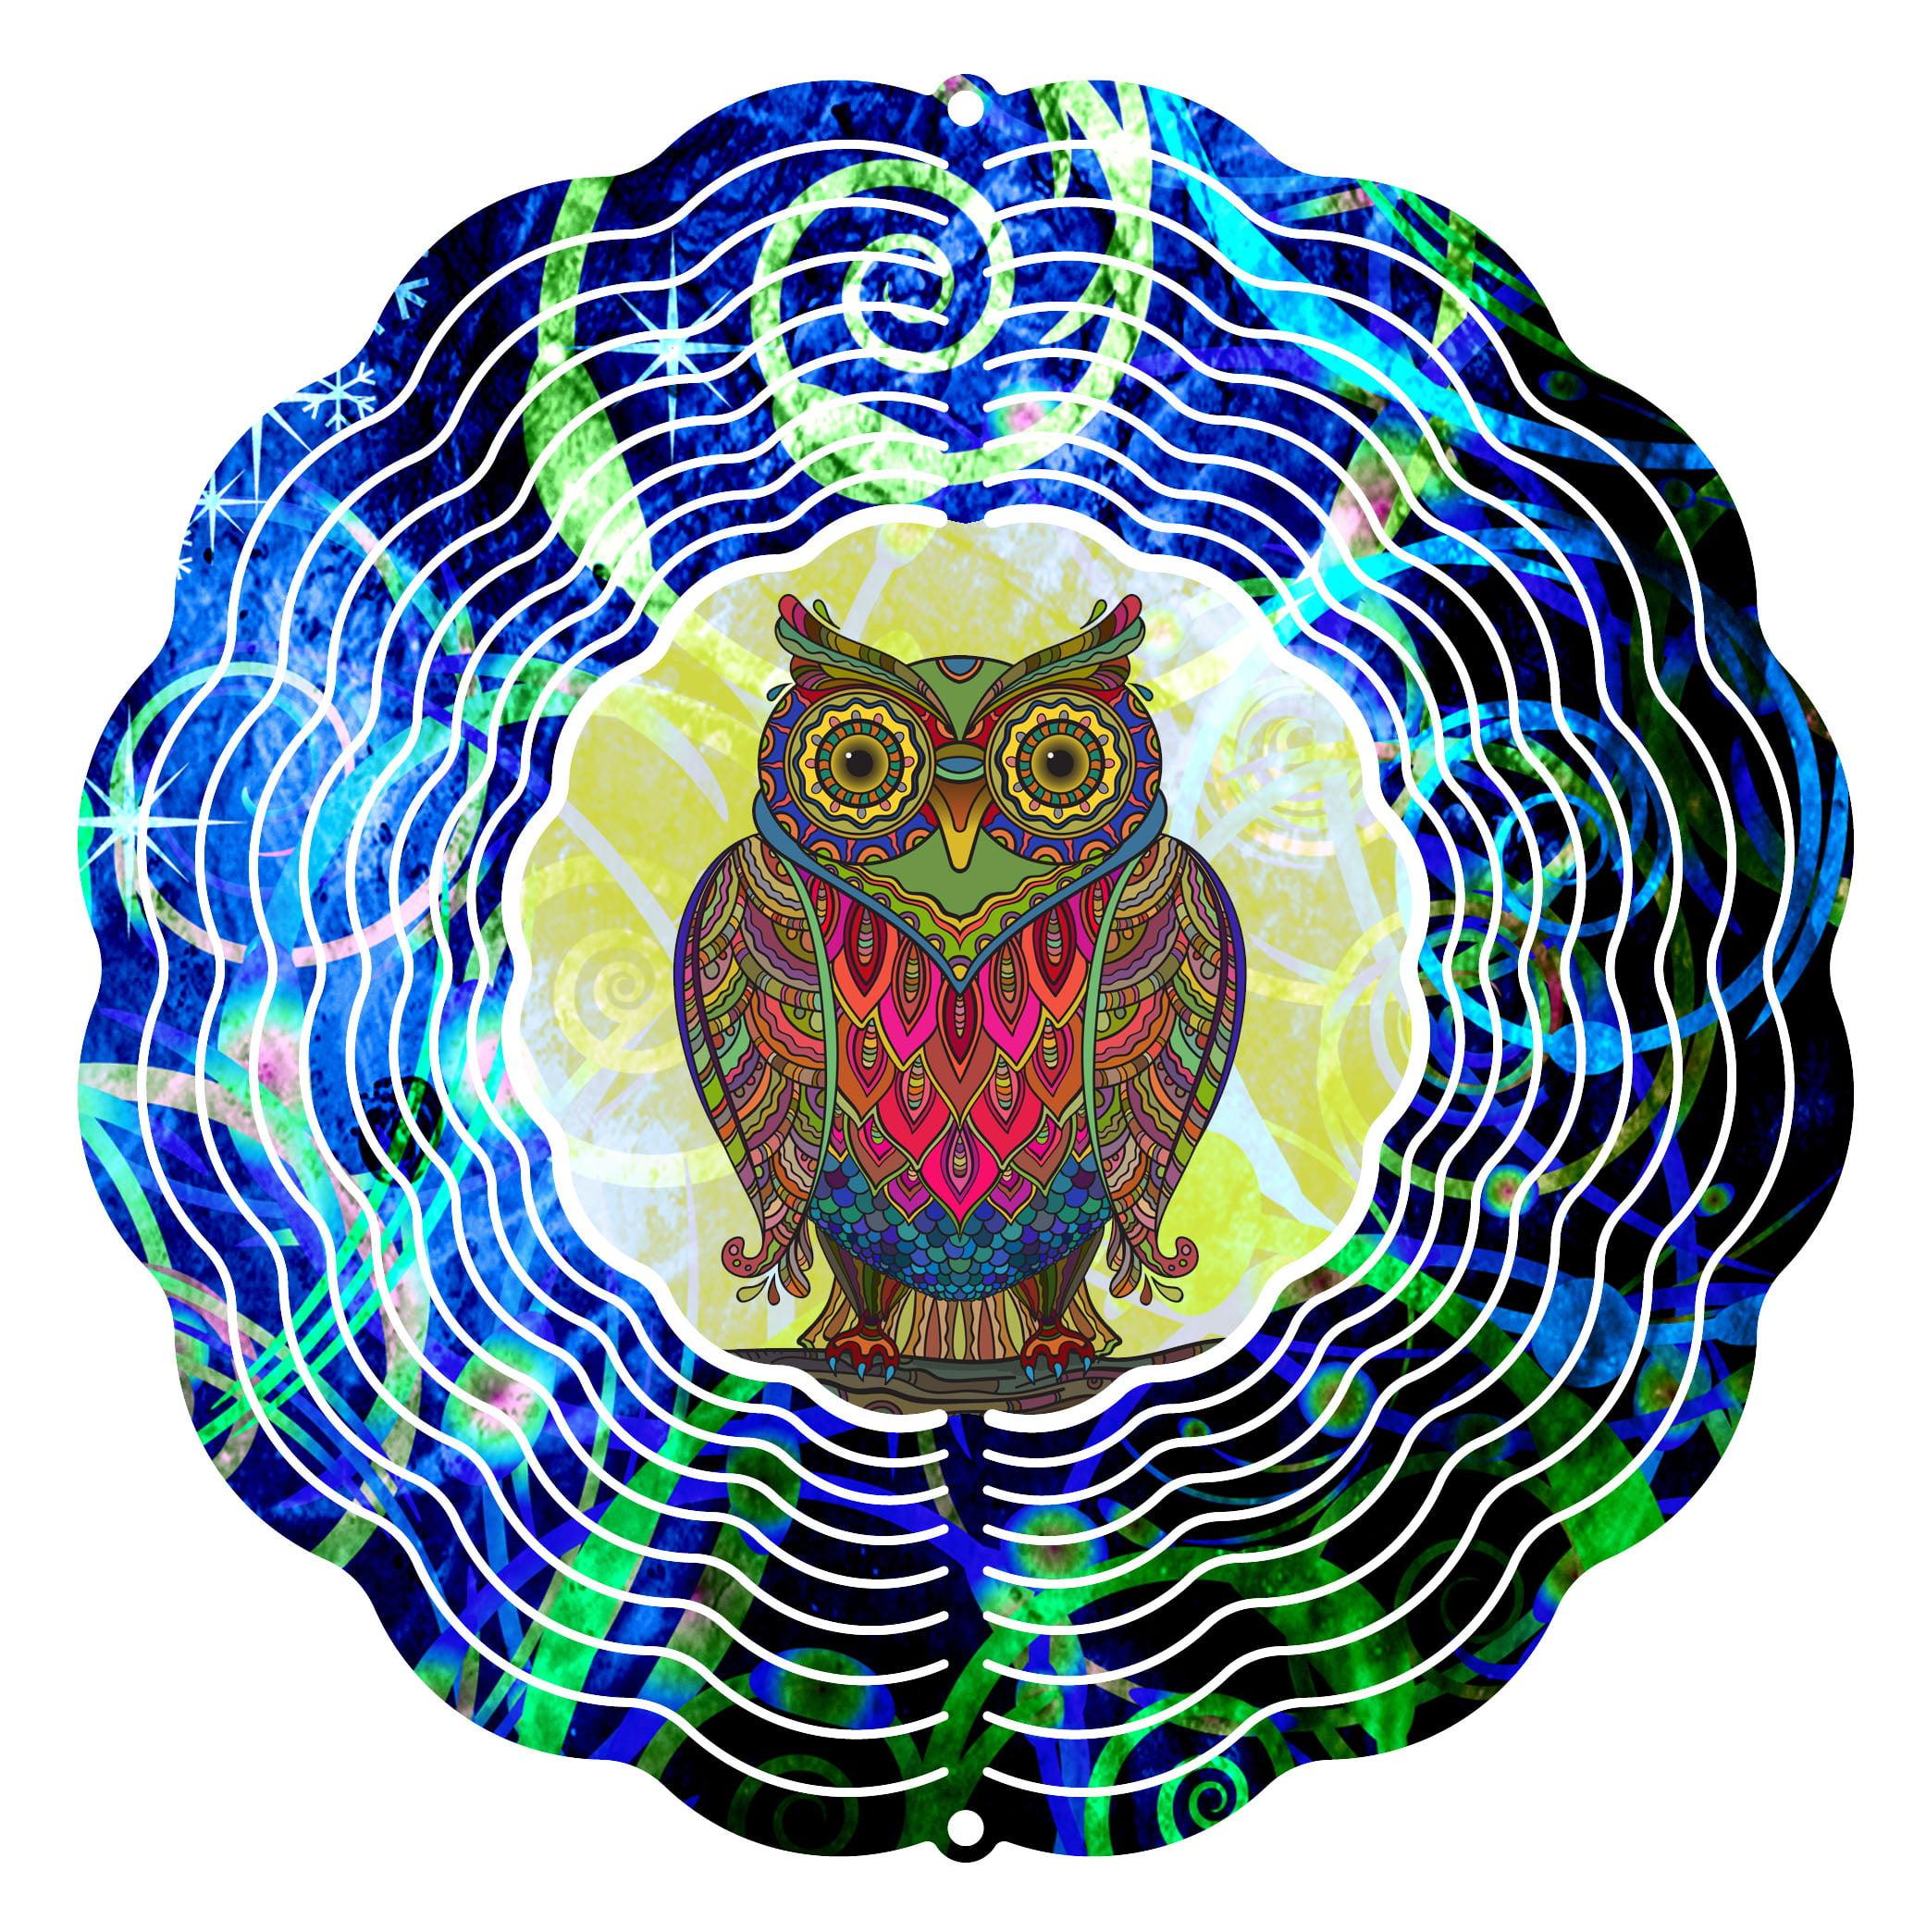 "Garden Wind Spinner Wise Mr Owl 10"" Wind Spinner by Next Innovations"